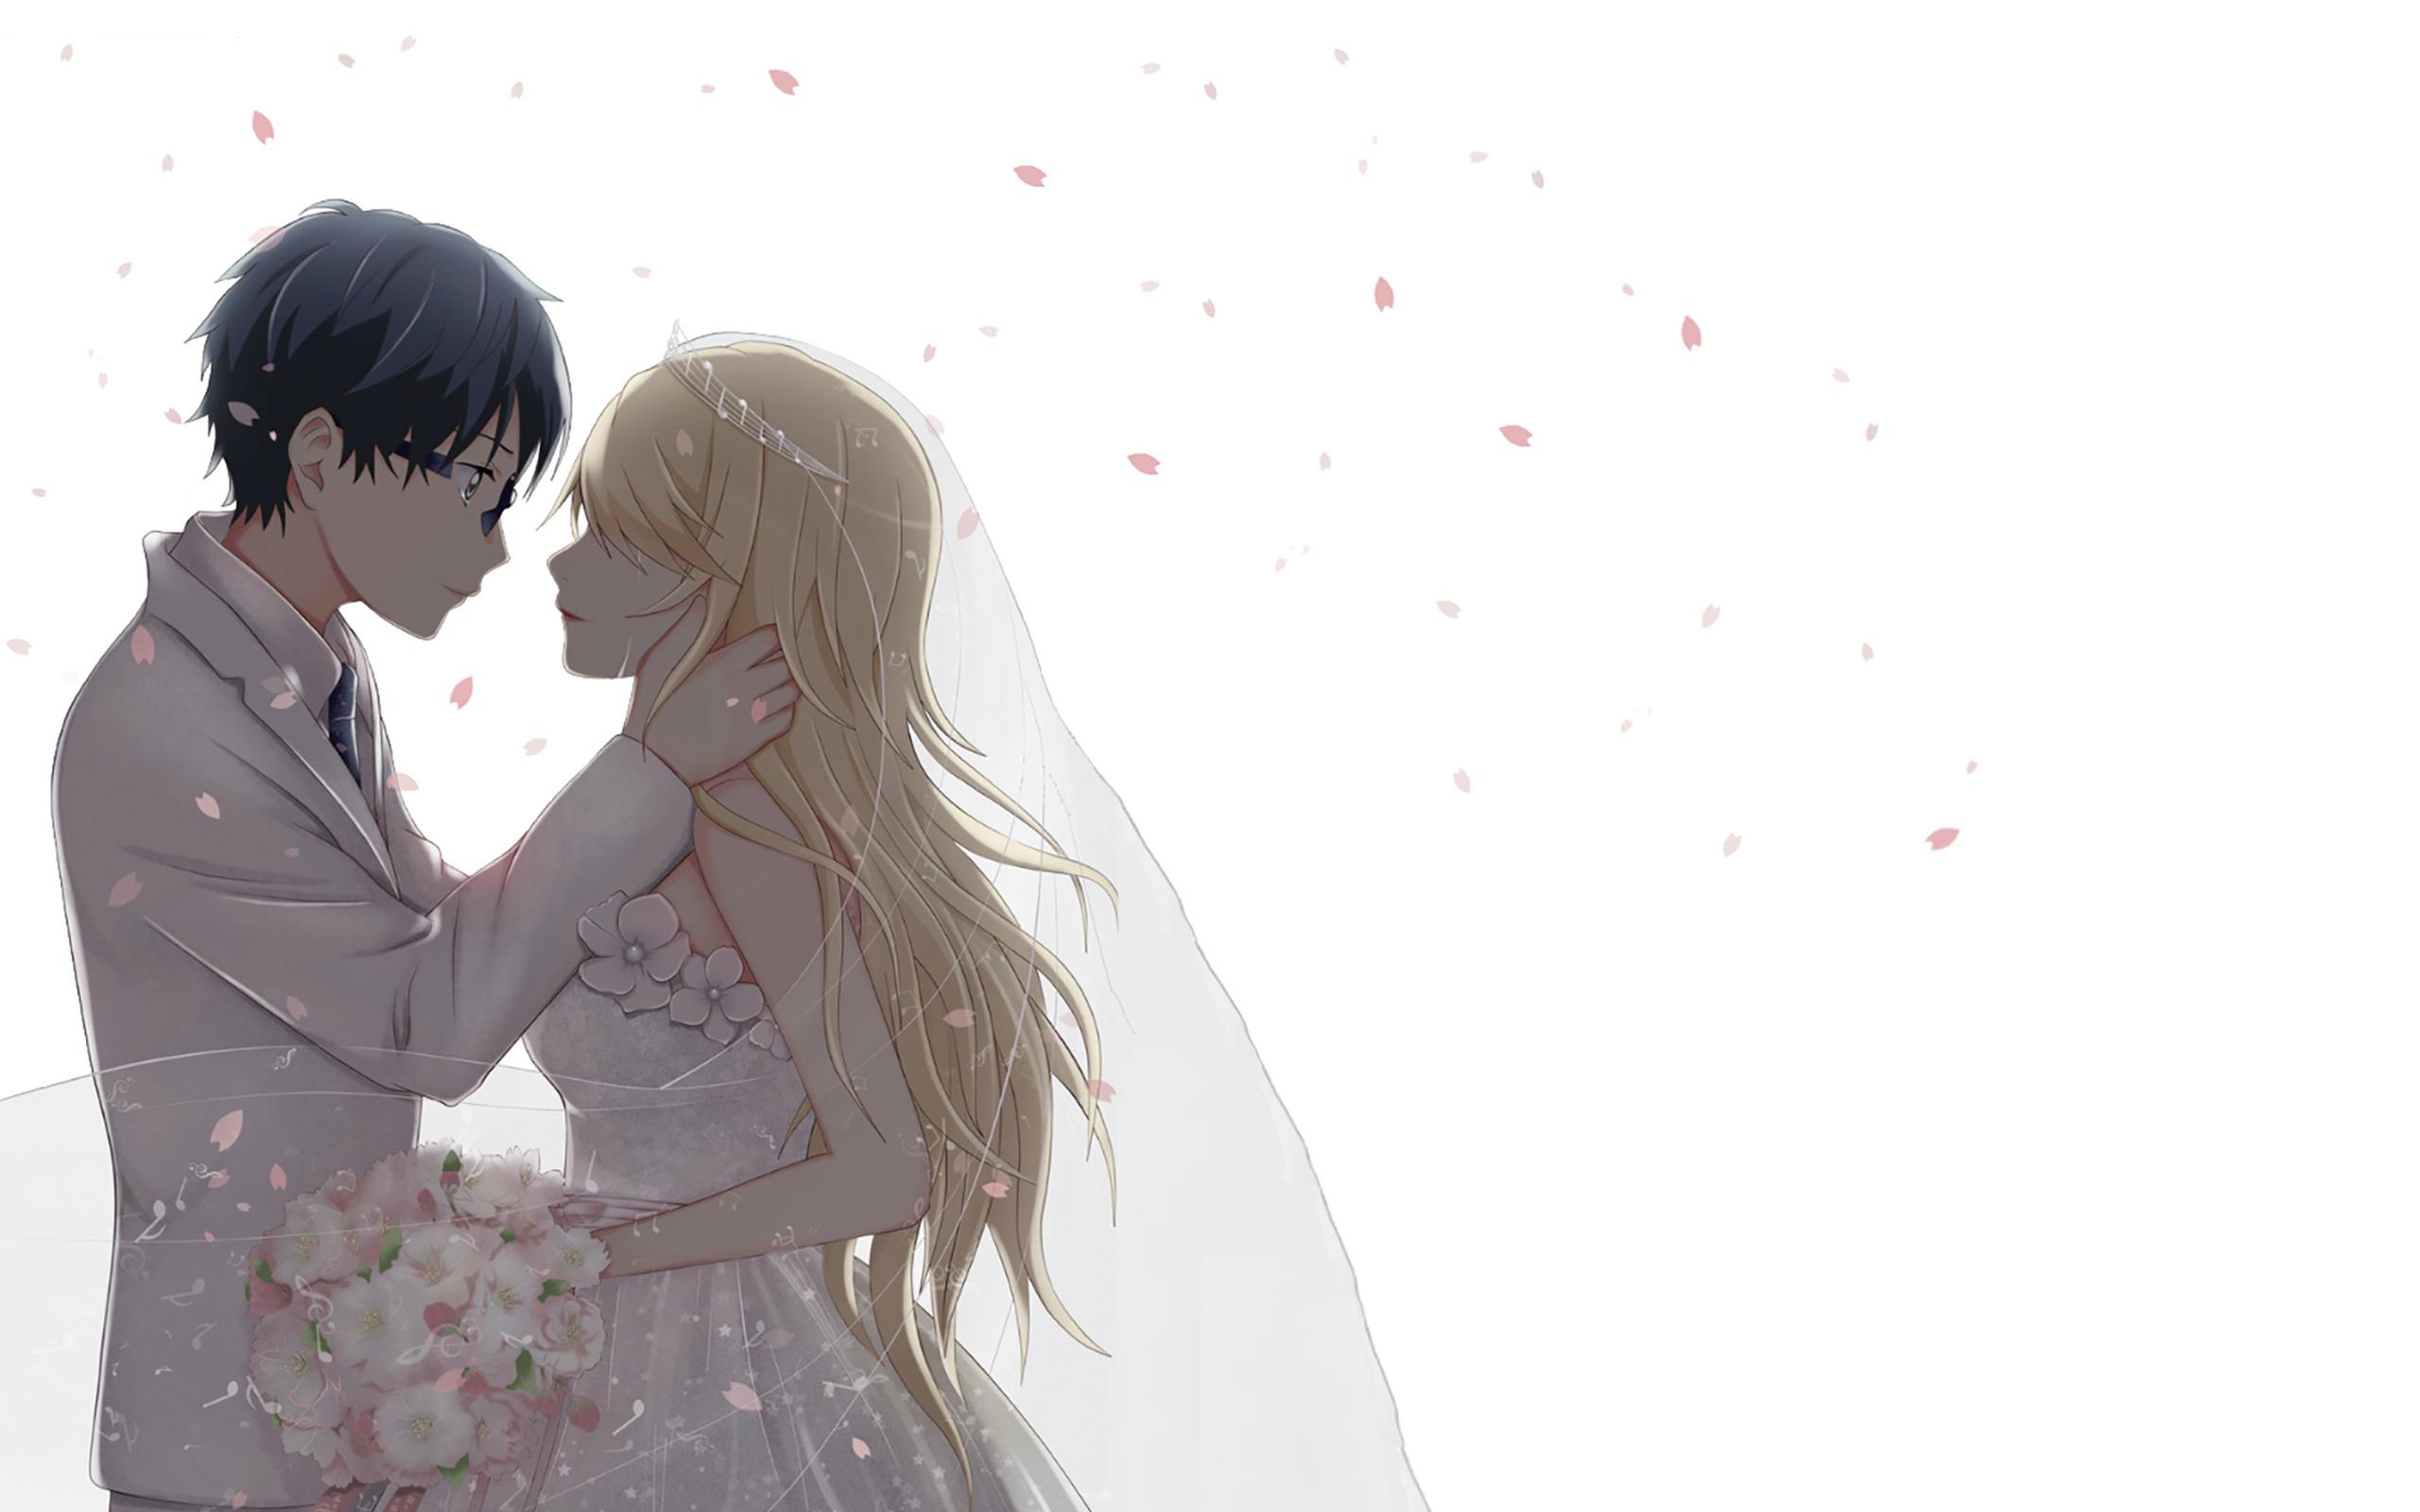 Cute Painting Hd Wallpapers Cute Anime Couple Hd Wallpapers Pixelstalk Net